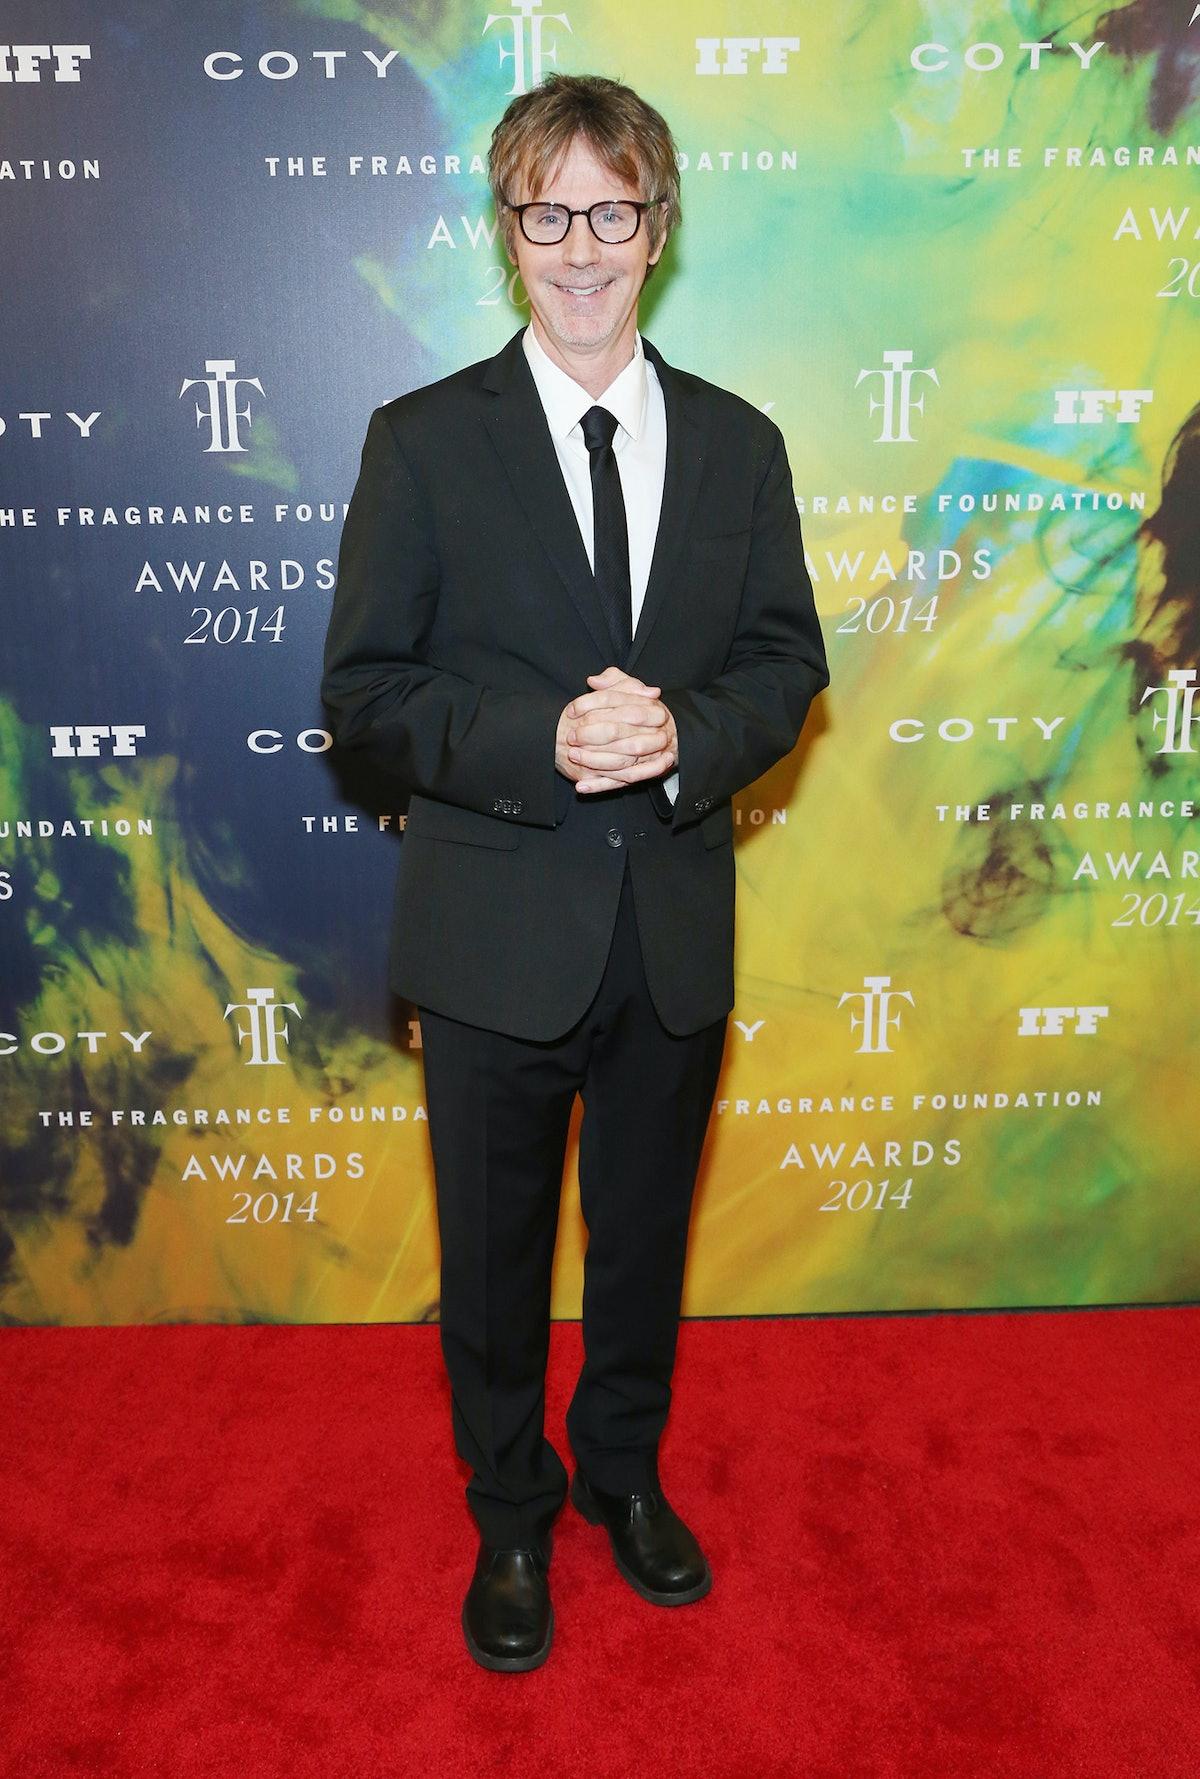 Dana Carvey Fragrance Awards